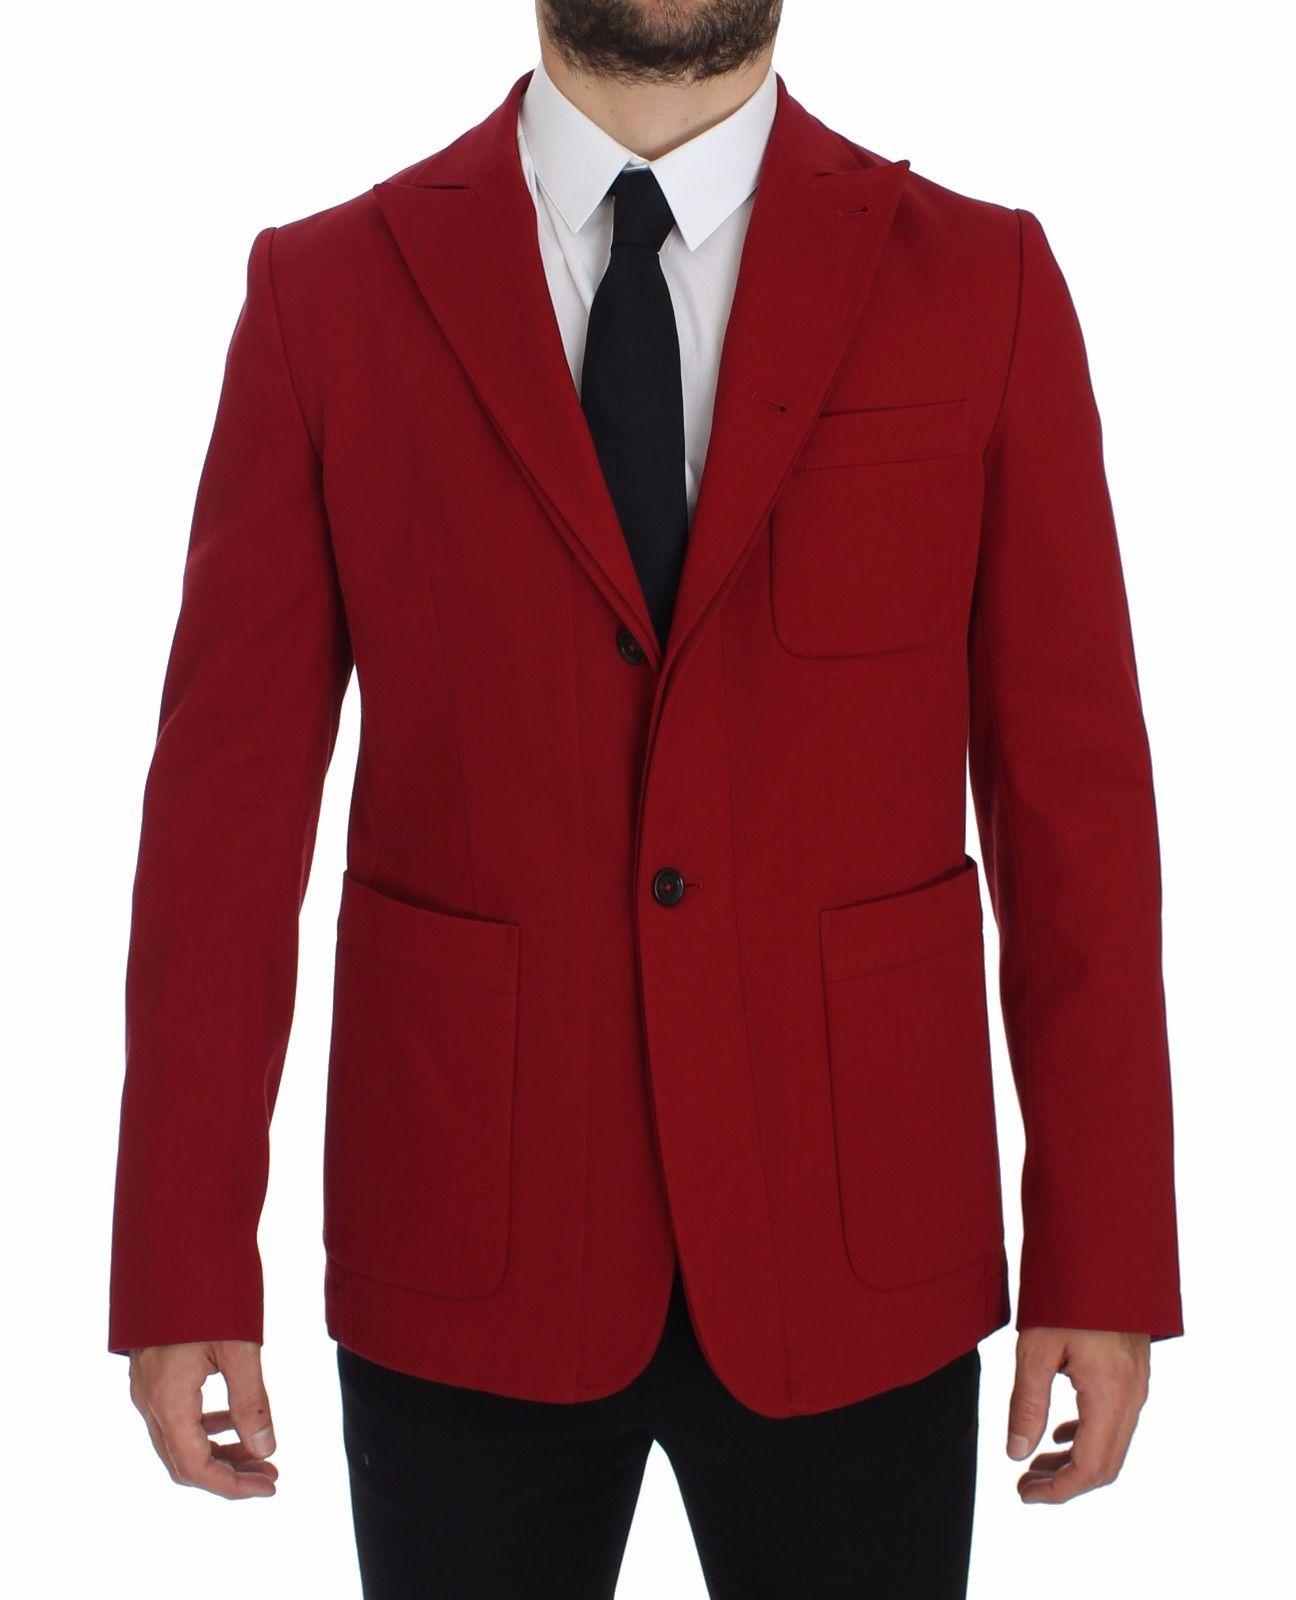 Dolce & Gabbana Men's Cotton Stretch Blazer Red GTT10106 - IT50   L